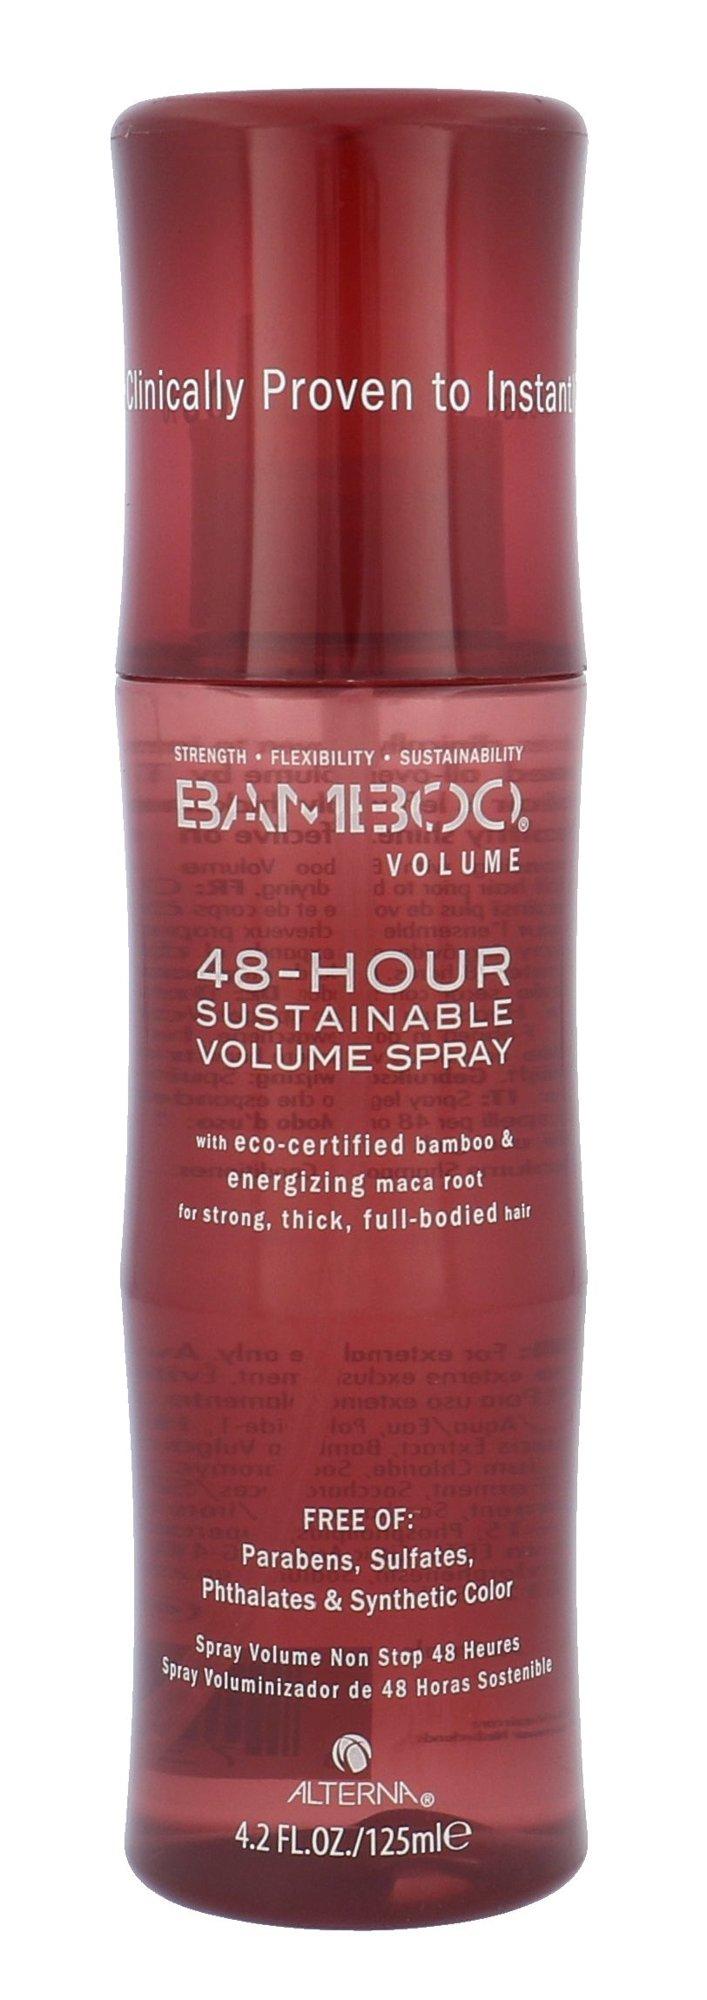 Alterna Bamboo Volume Hair Volume 125ml